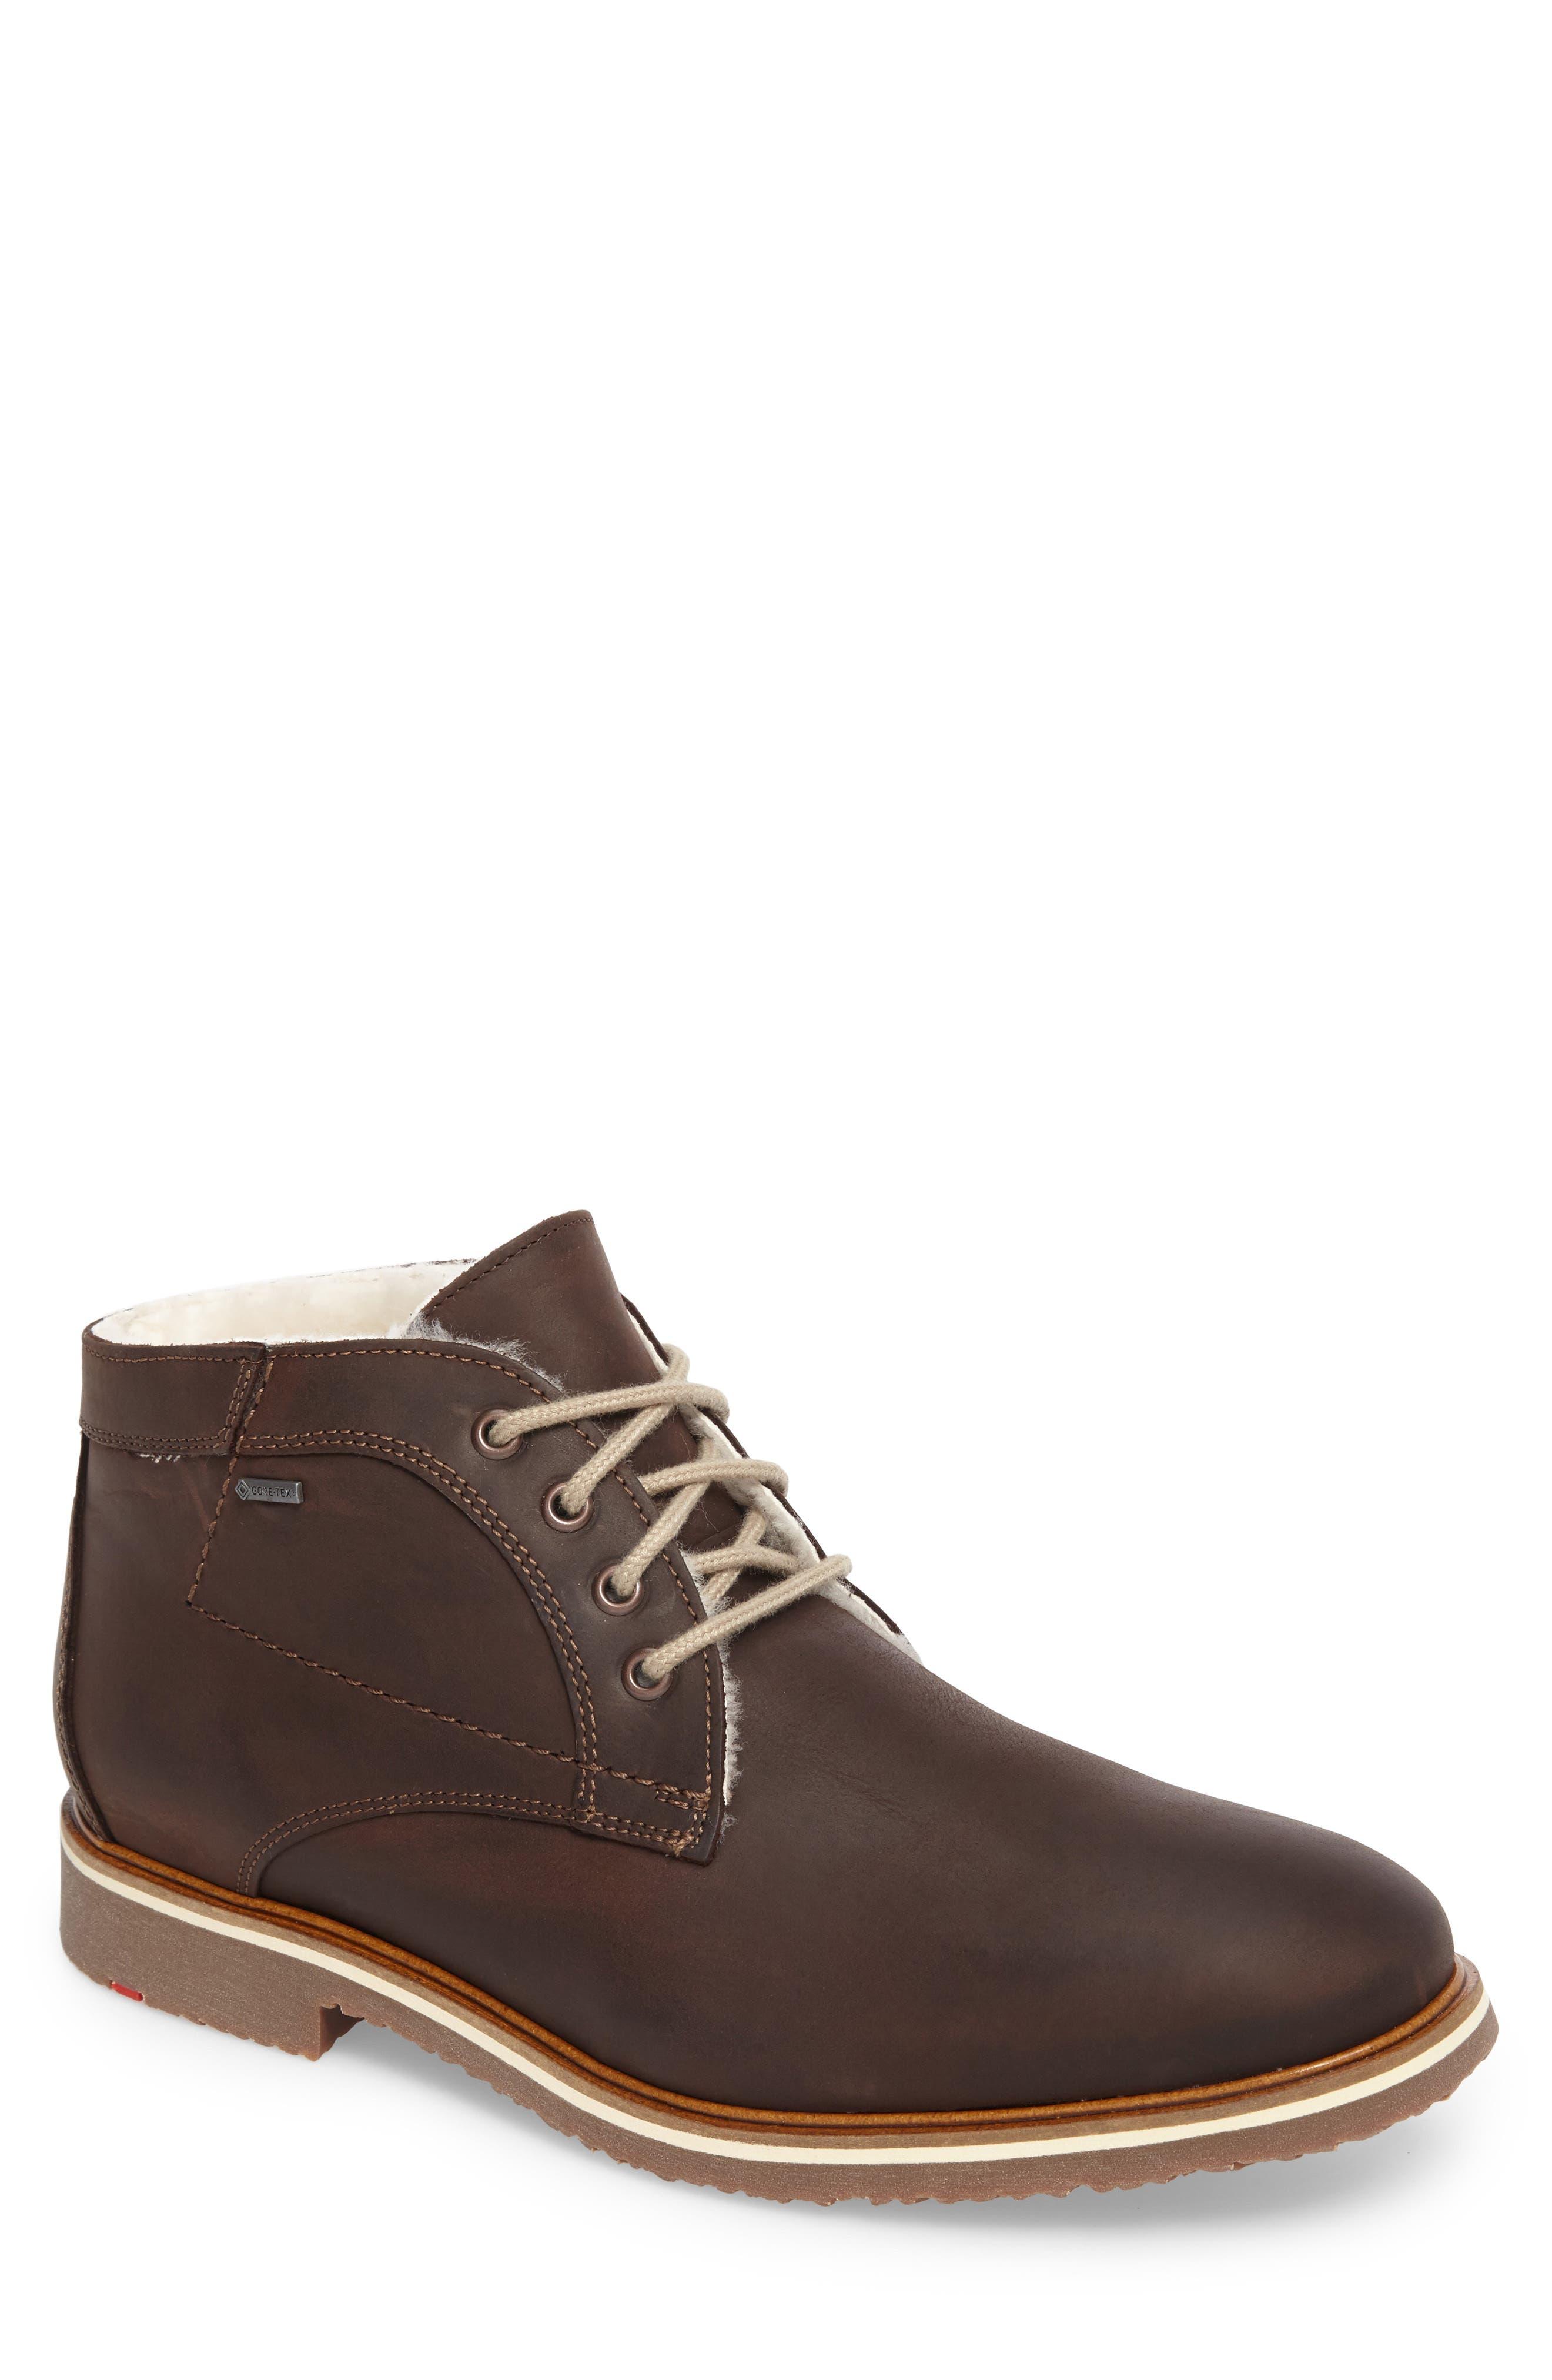 Varus Waterproof Shearlng Lined Chukka Boot,                         Main,                         color, Ebony Leather